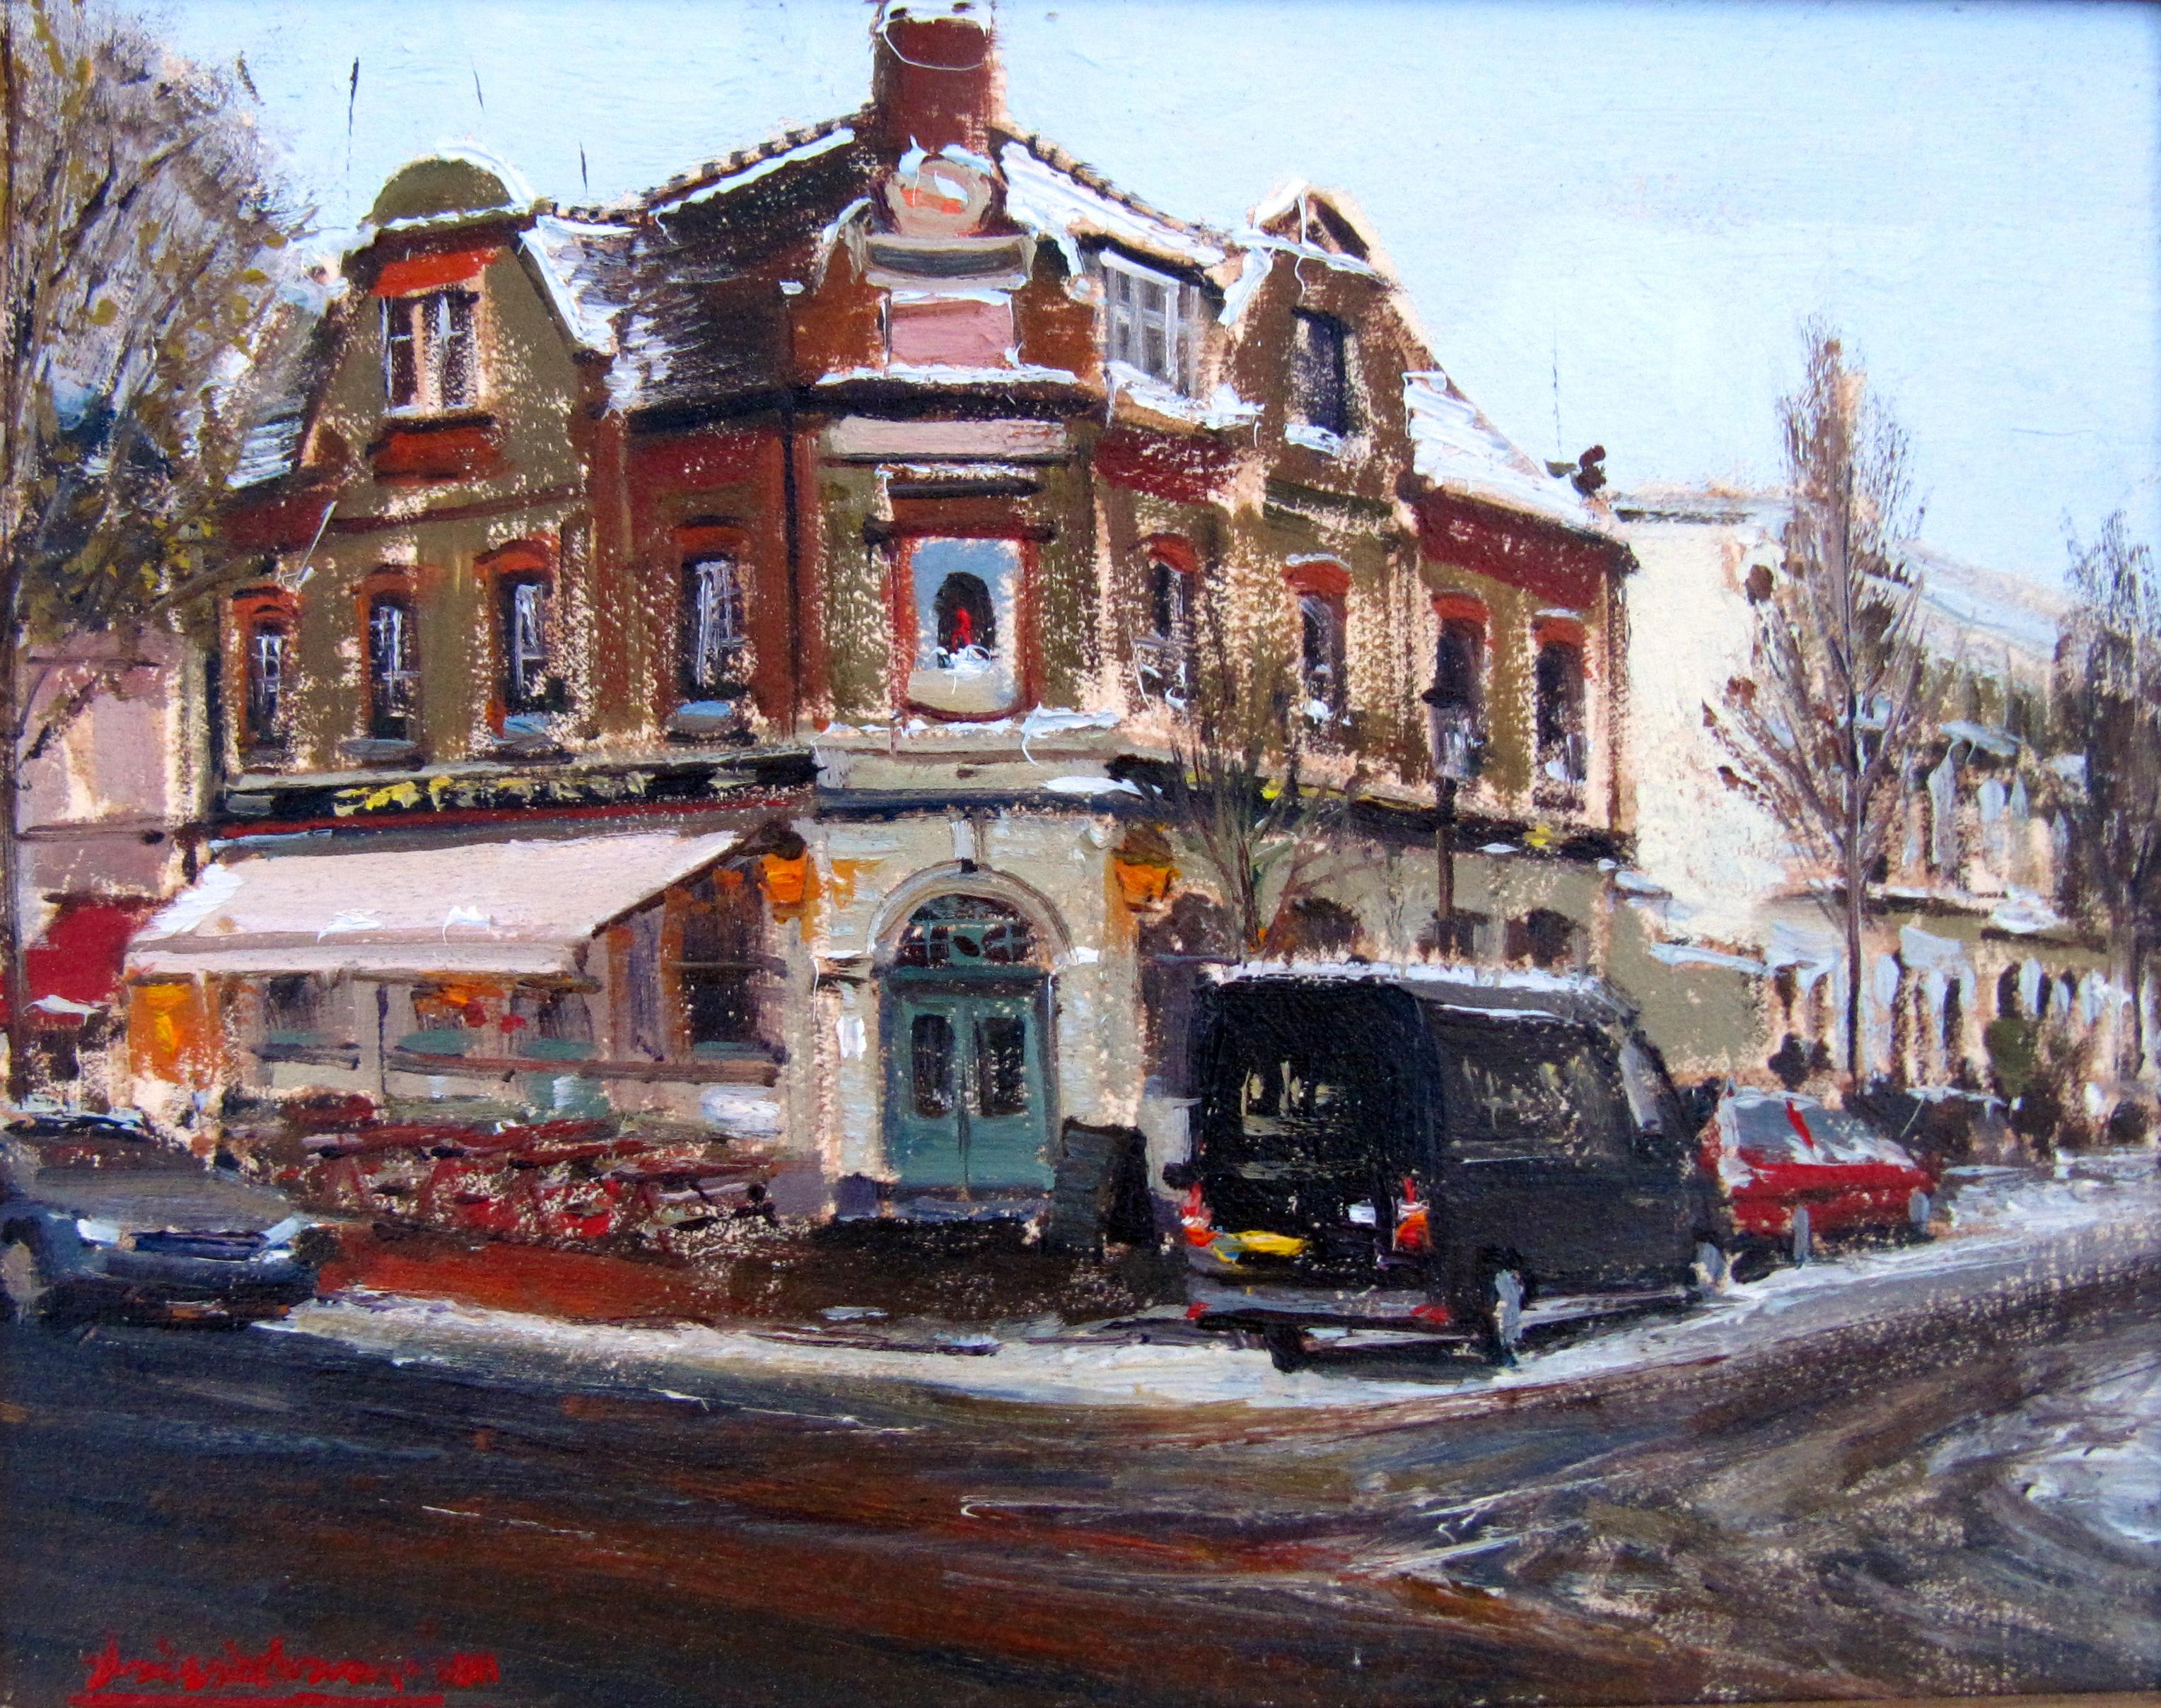 The Chelsea ram in snow